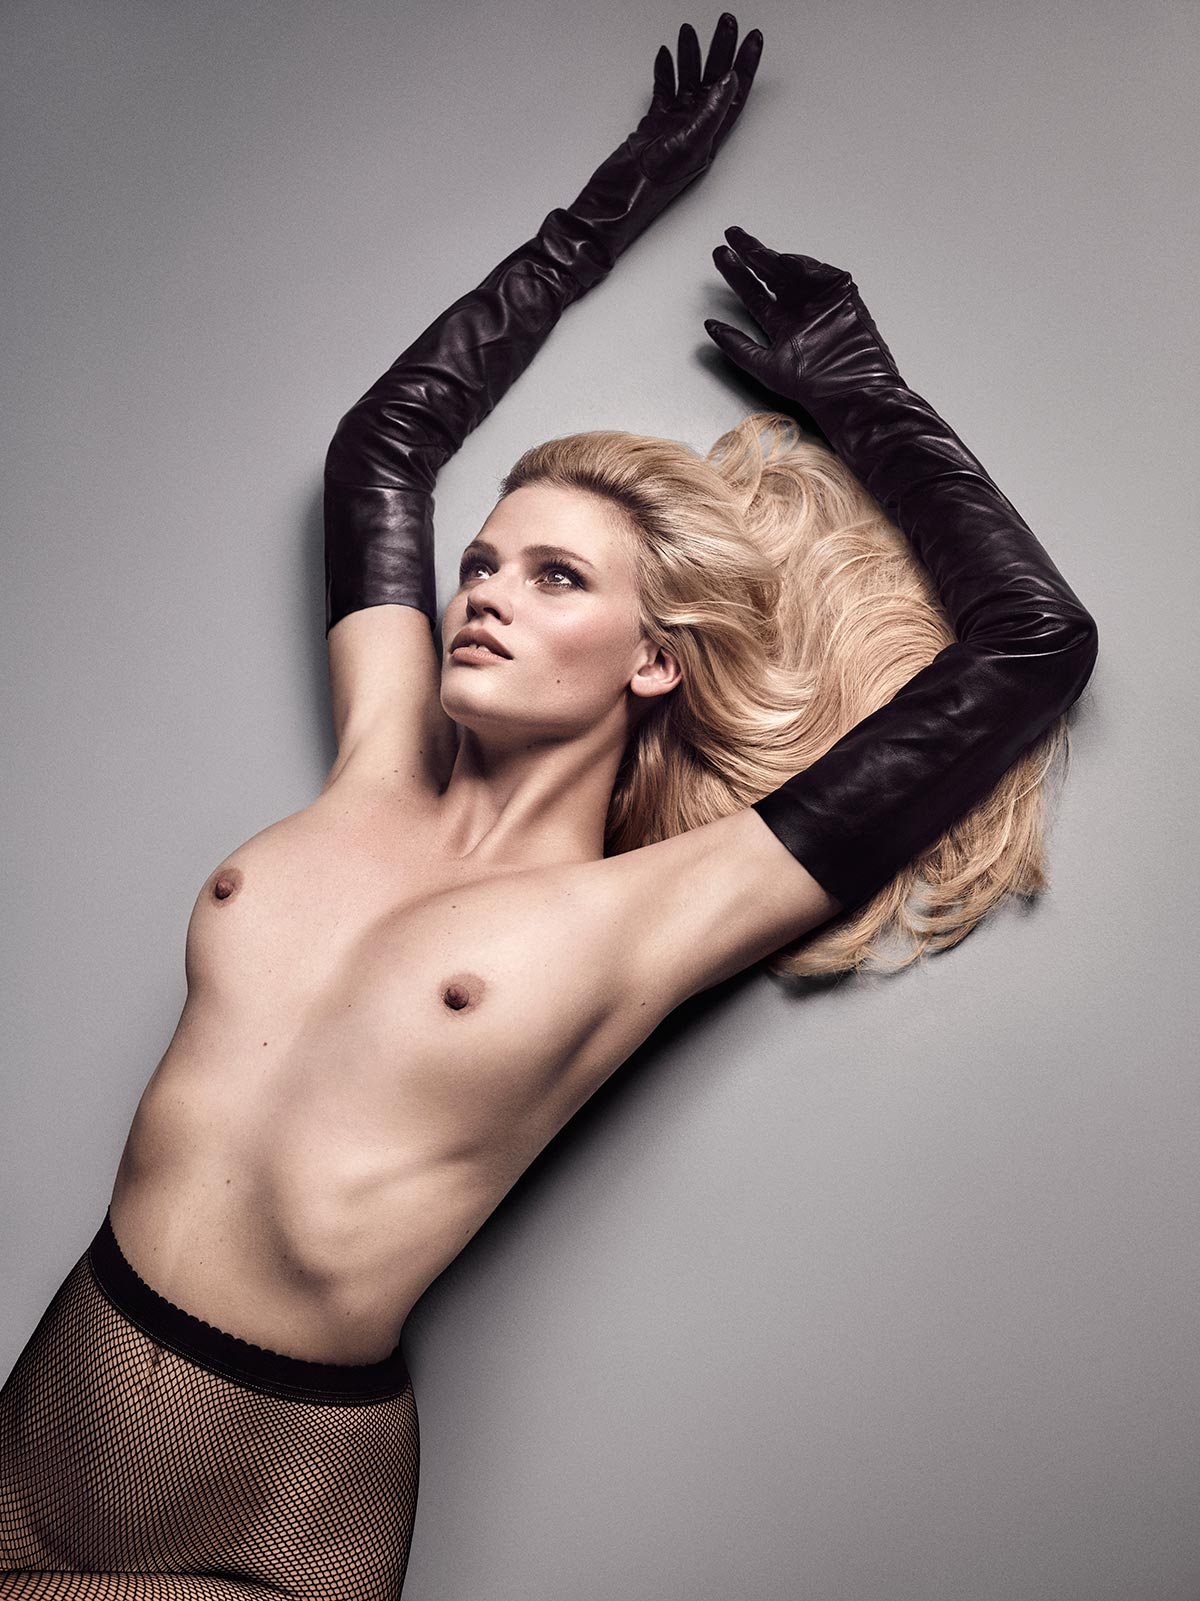 Lara Stone topless photos (8)